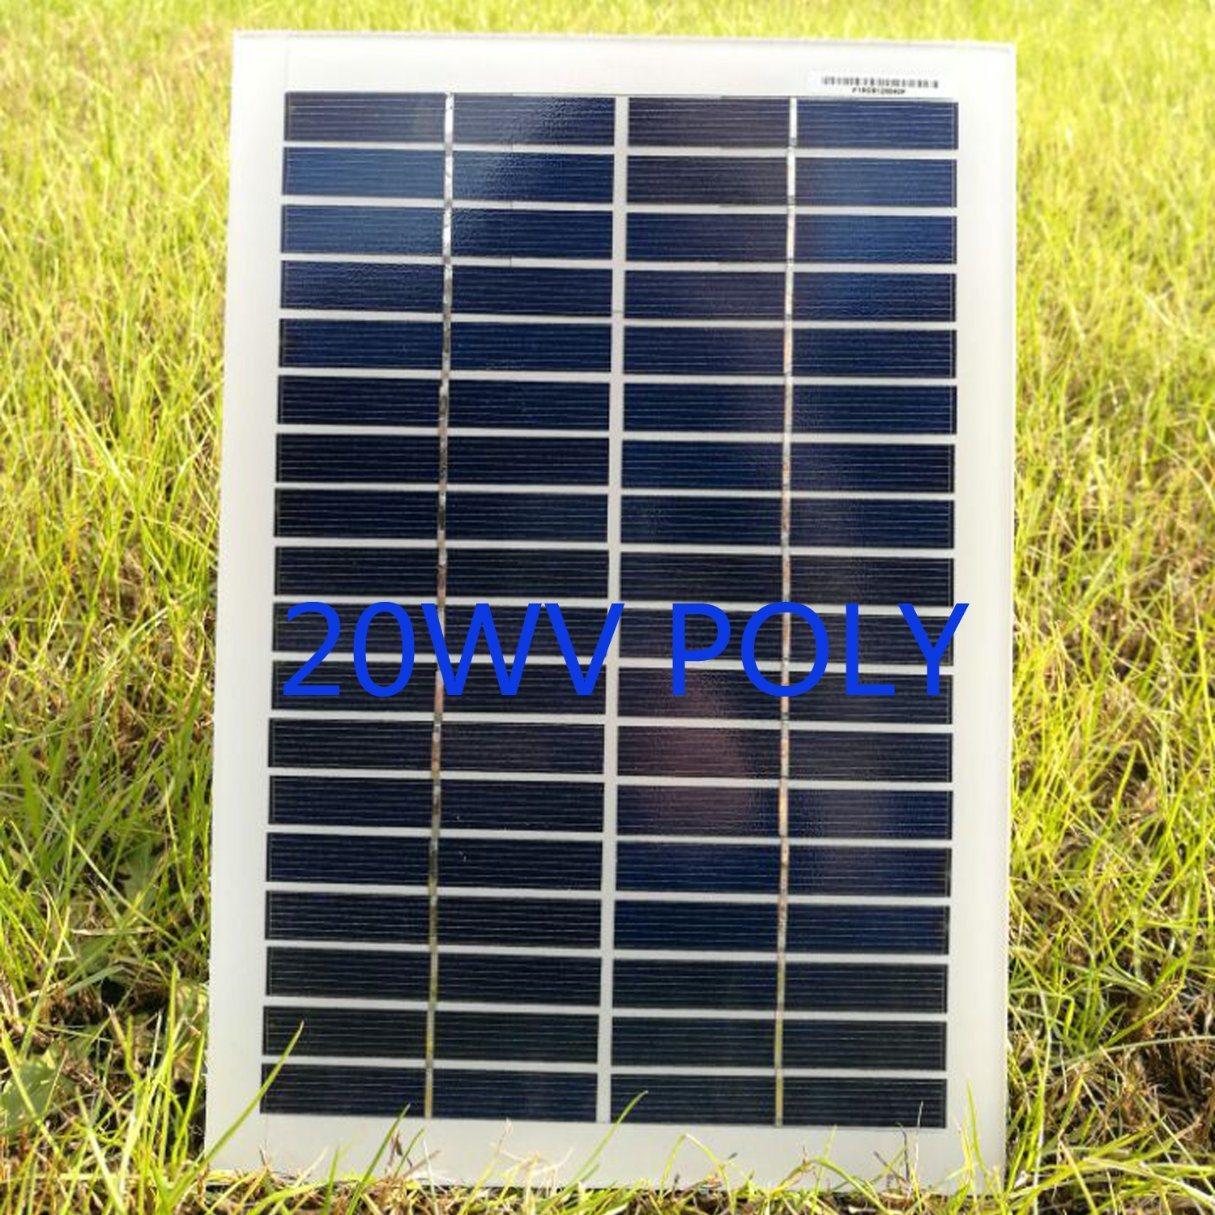 30W High Efficiency Solar Panel for Street Lighting